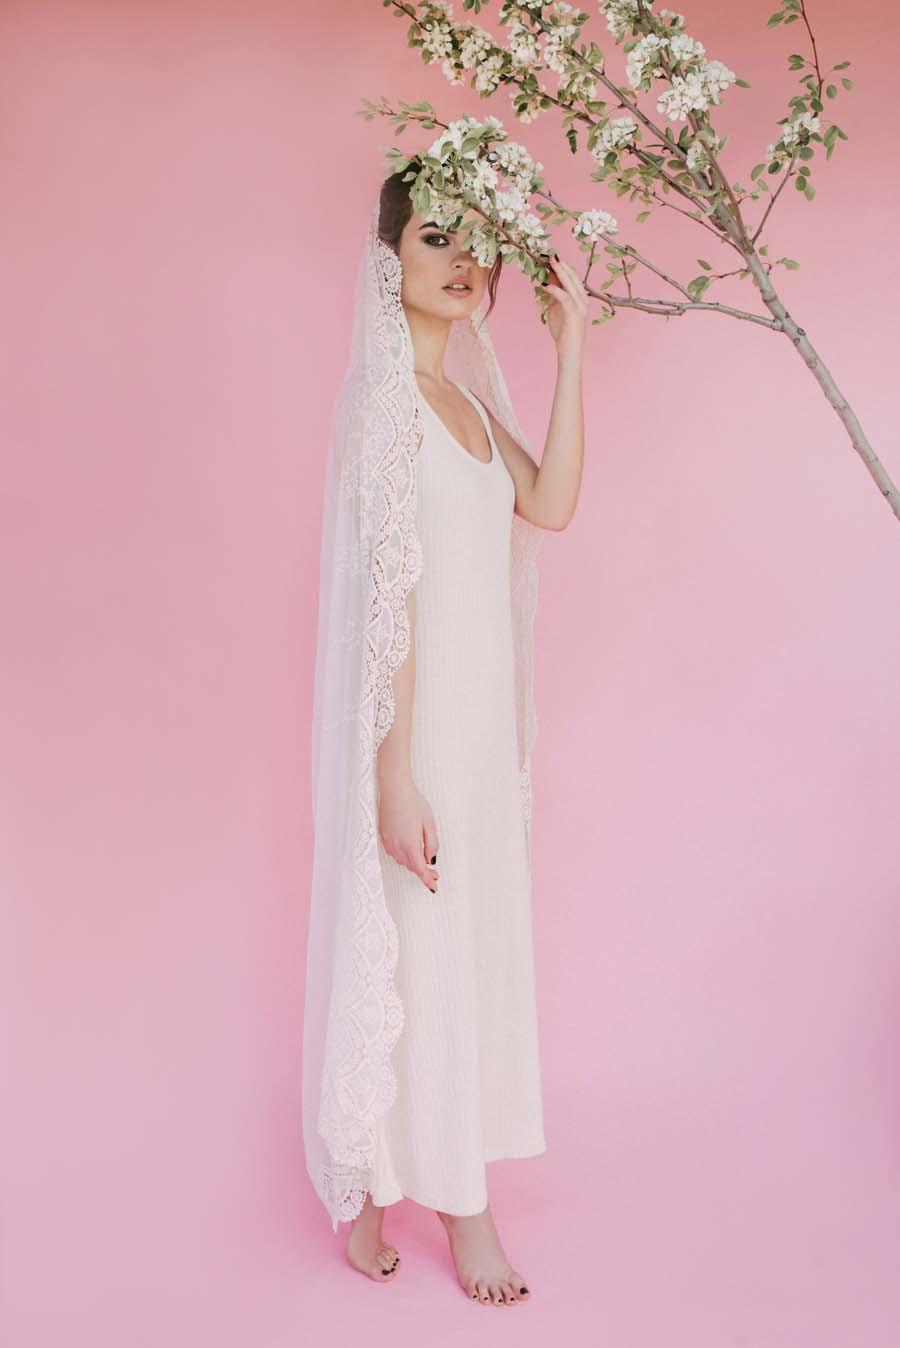 Pretty, Fun & Totally Unique Wedding Veils by Biba's Closet #veilmeagain